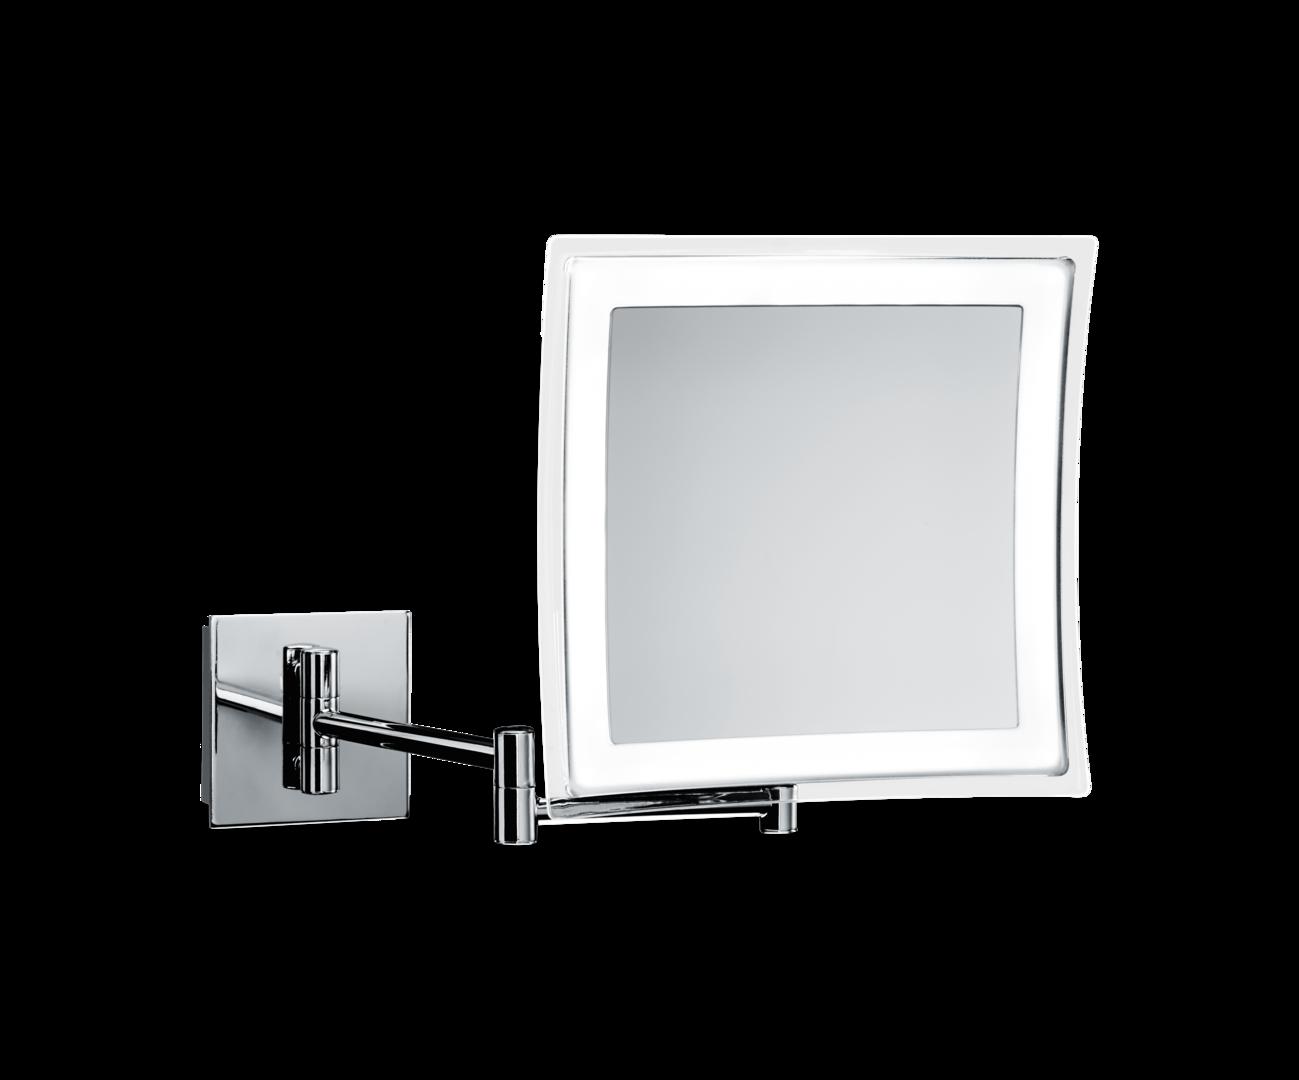 miroir cosm tique avec clairage bs 85 decor walther. Black Bedroom Furniture Sets. Home Design Ideas